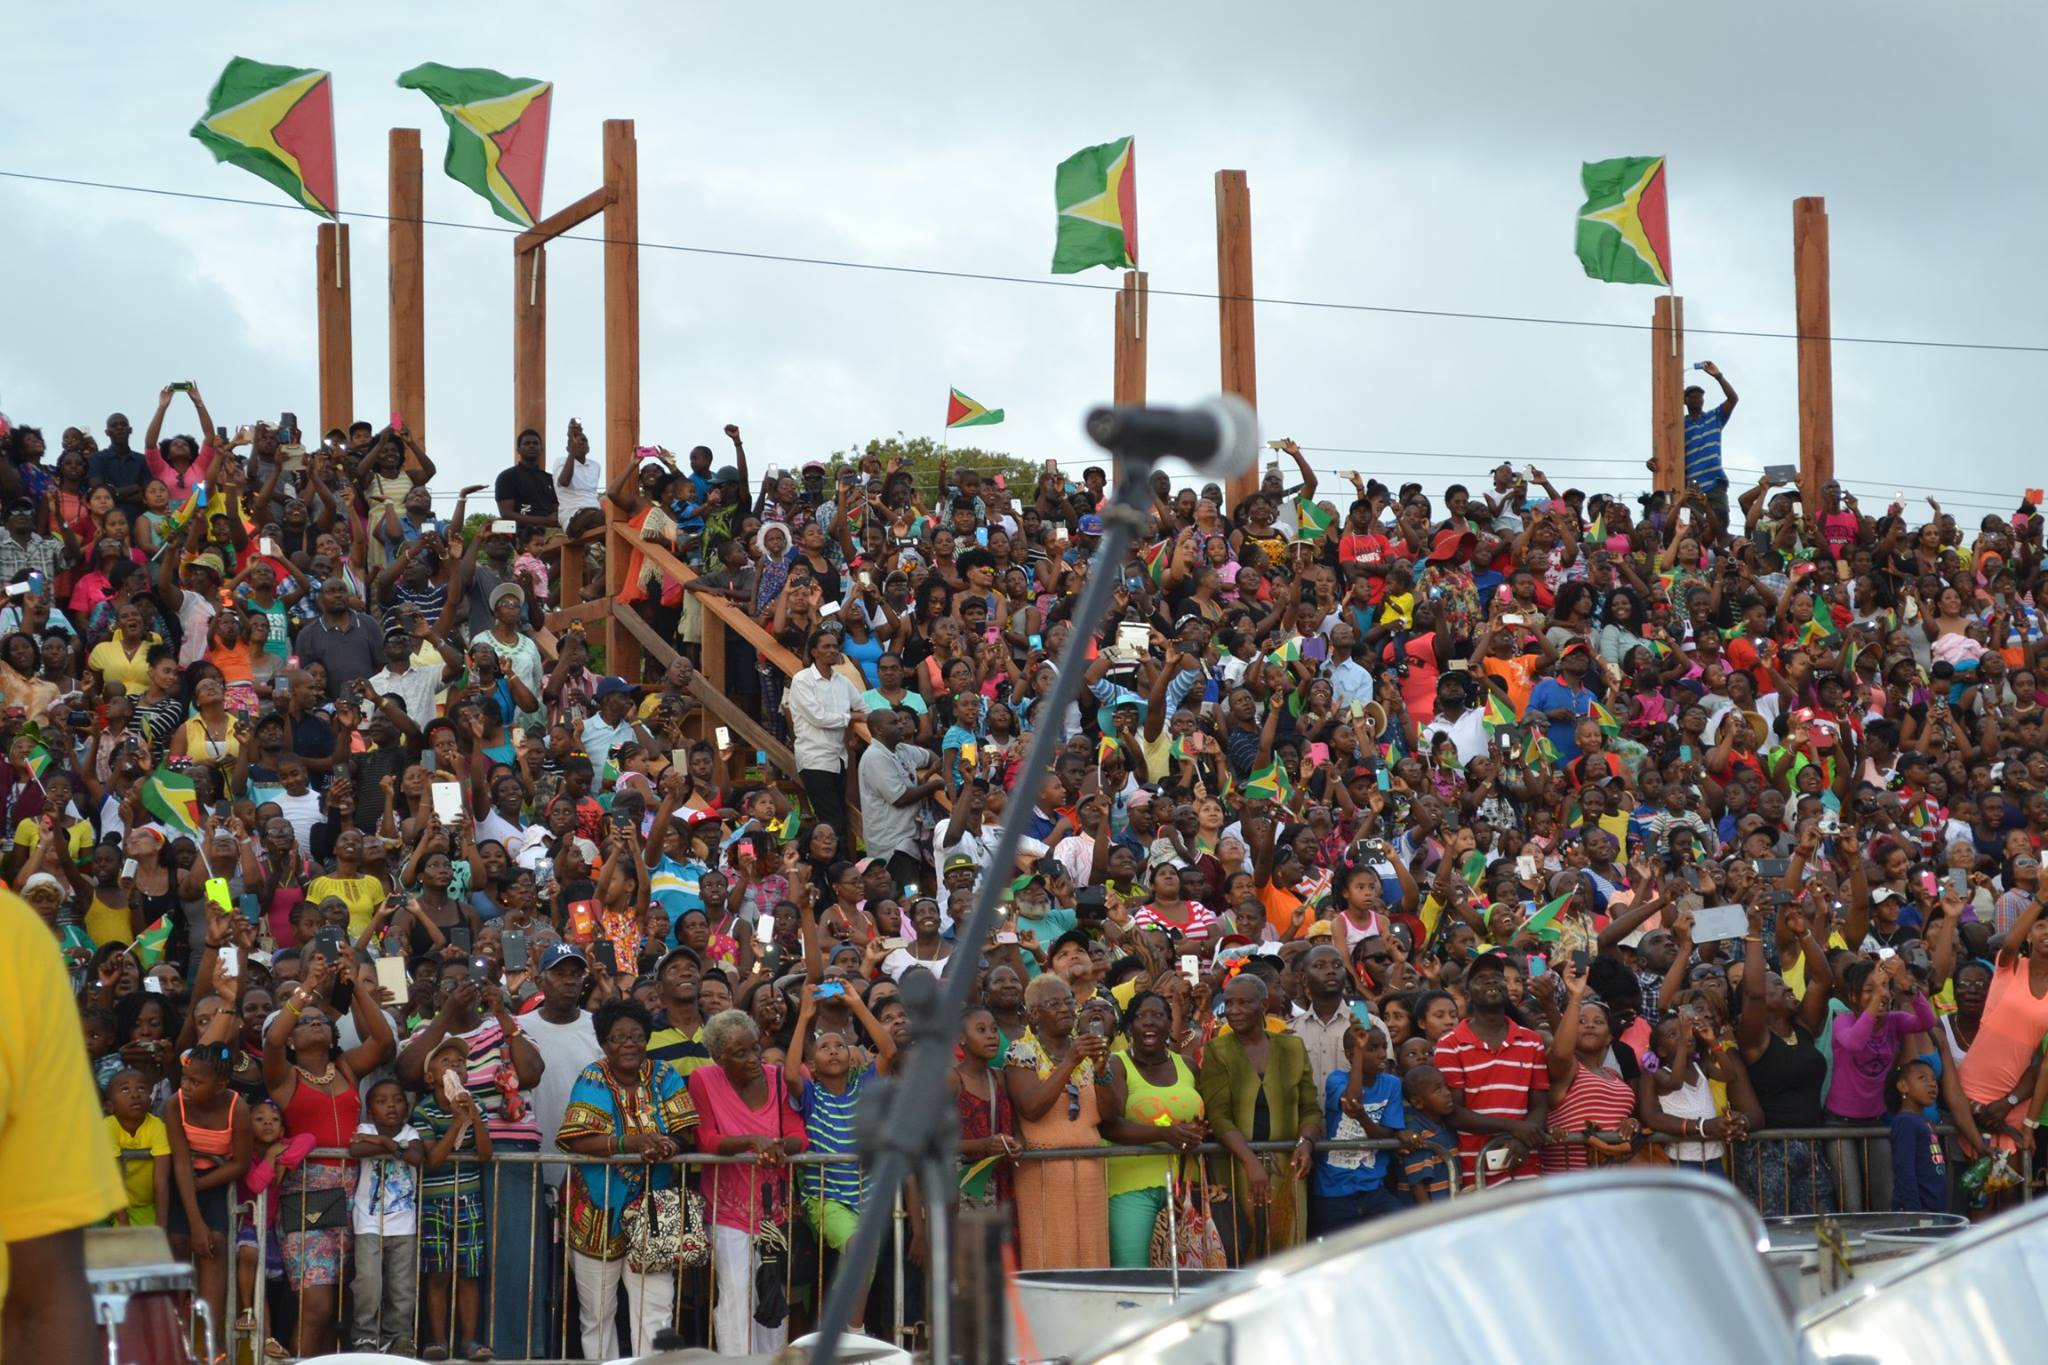 Image courtesy Government of Guyana